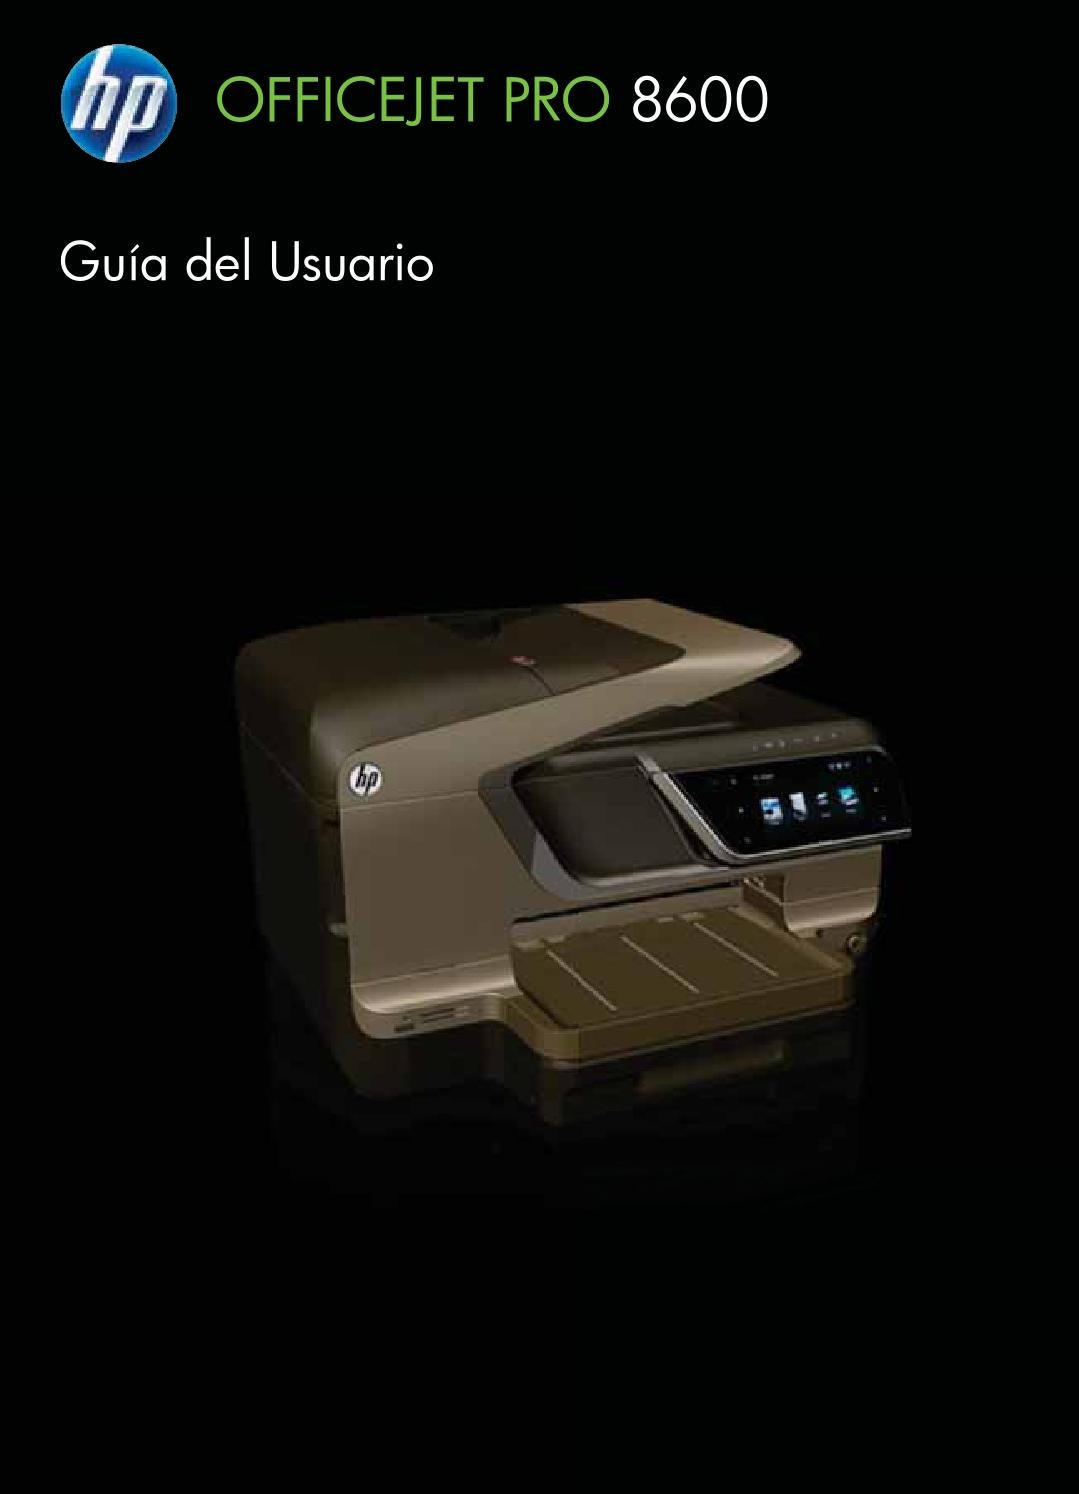 Guia de usuario officejet pro 8600 pro by Pedro Velez Gonzalez - issuu